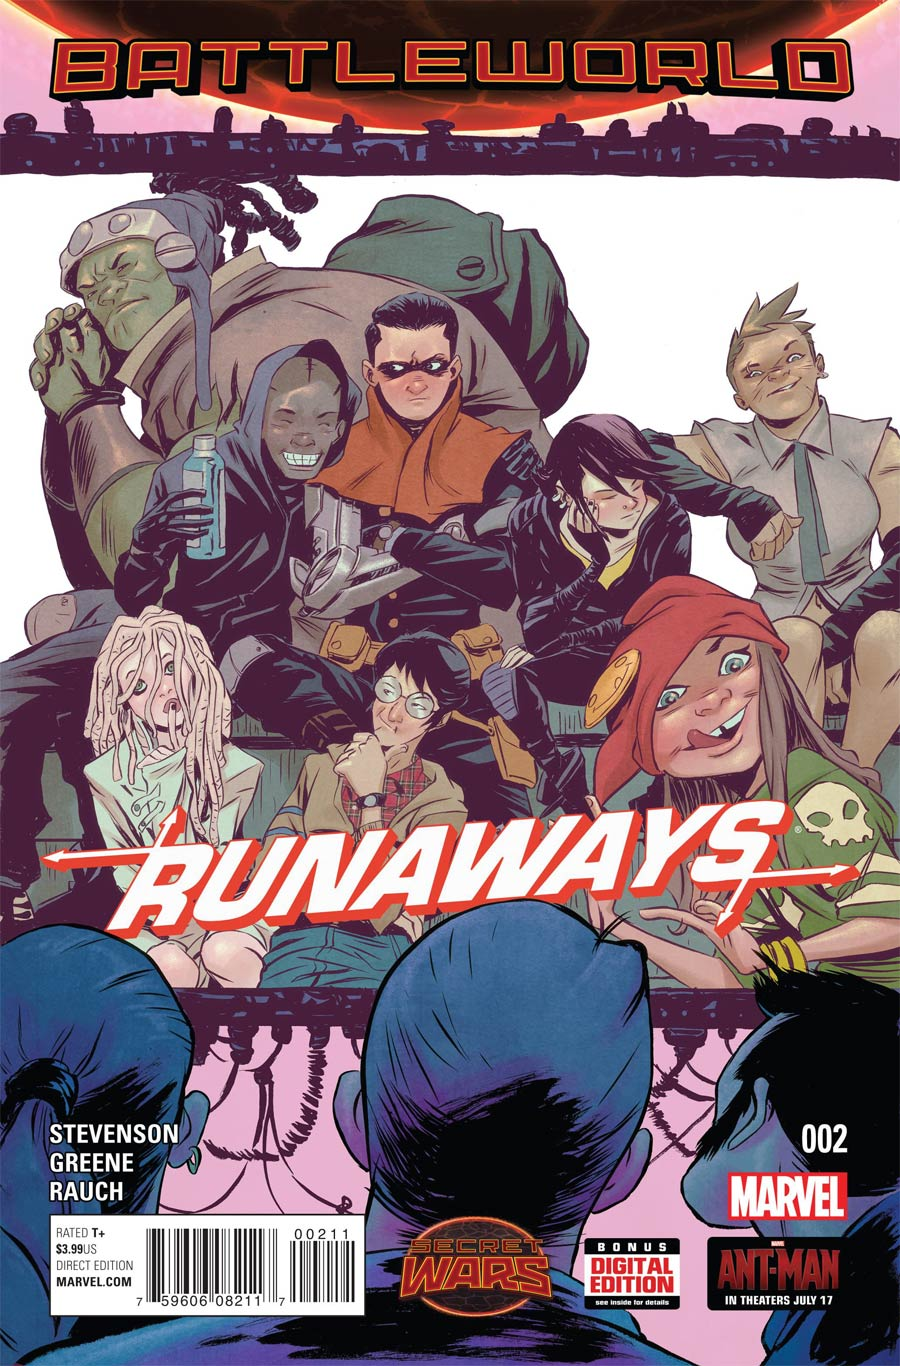 Runaways Vol 4 #2 Cover A Regular Sanford Greene Cover (Secret Wars Battleworld Tie-In)